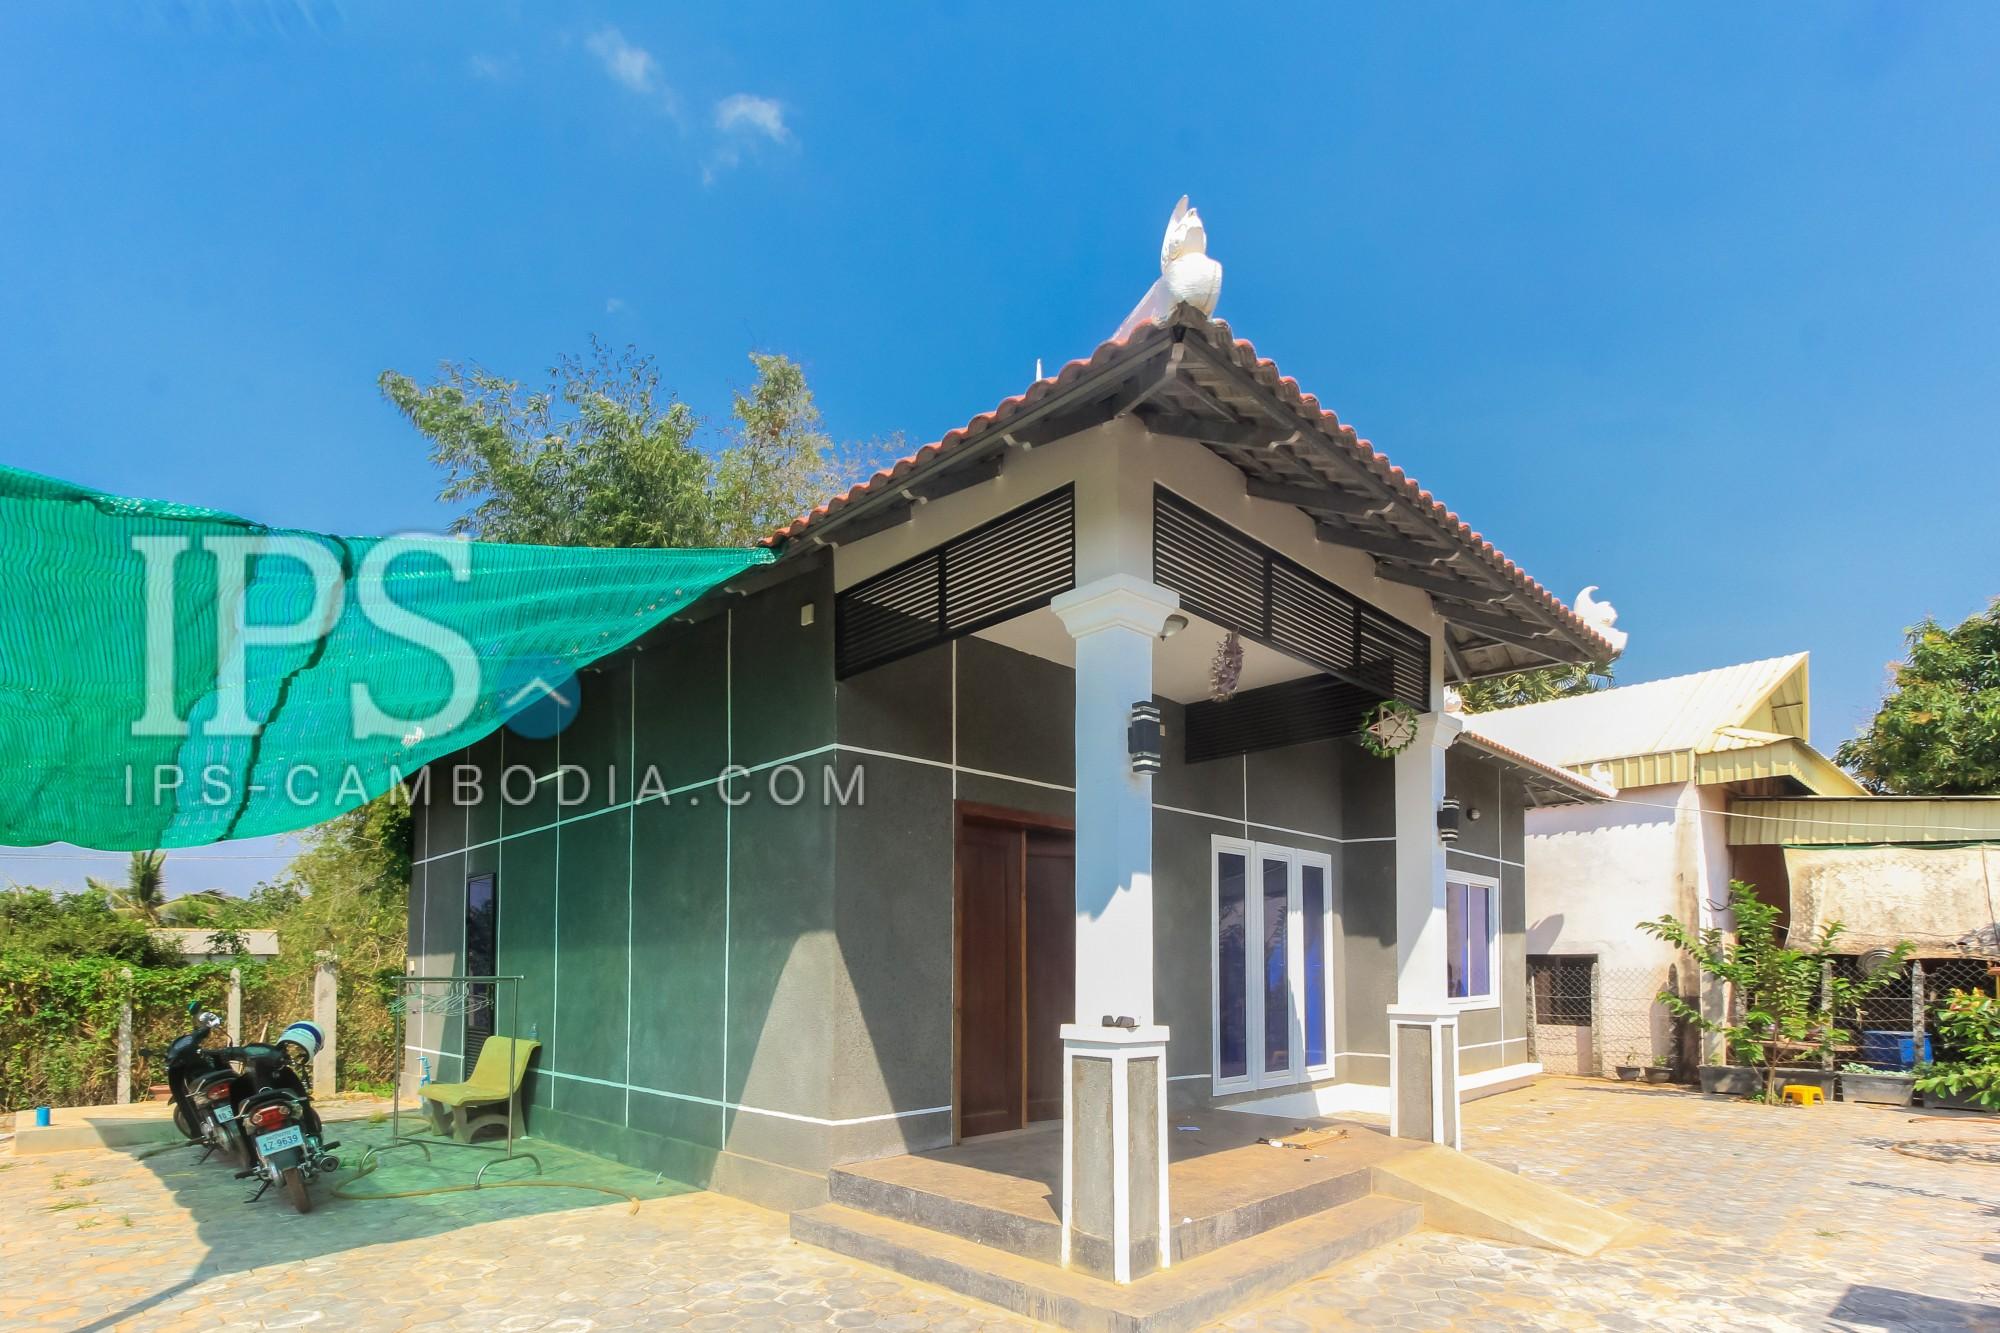 2 Bedroom Villa for Rent - Siem Reap